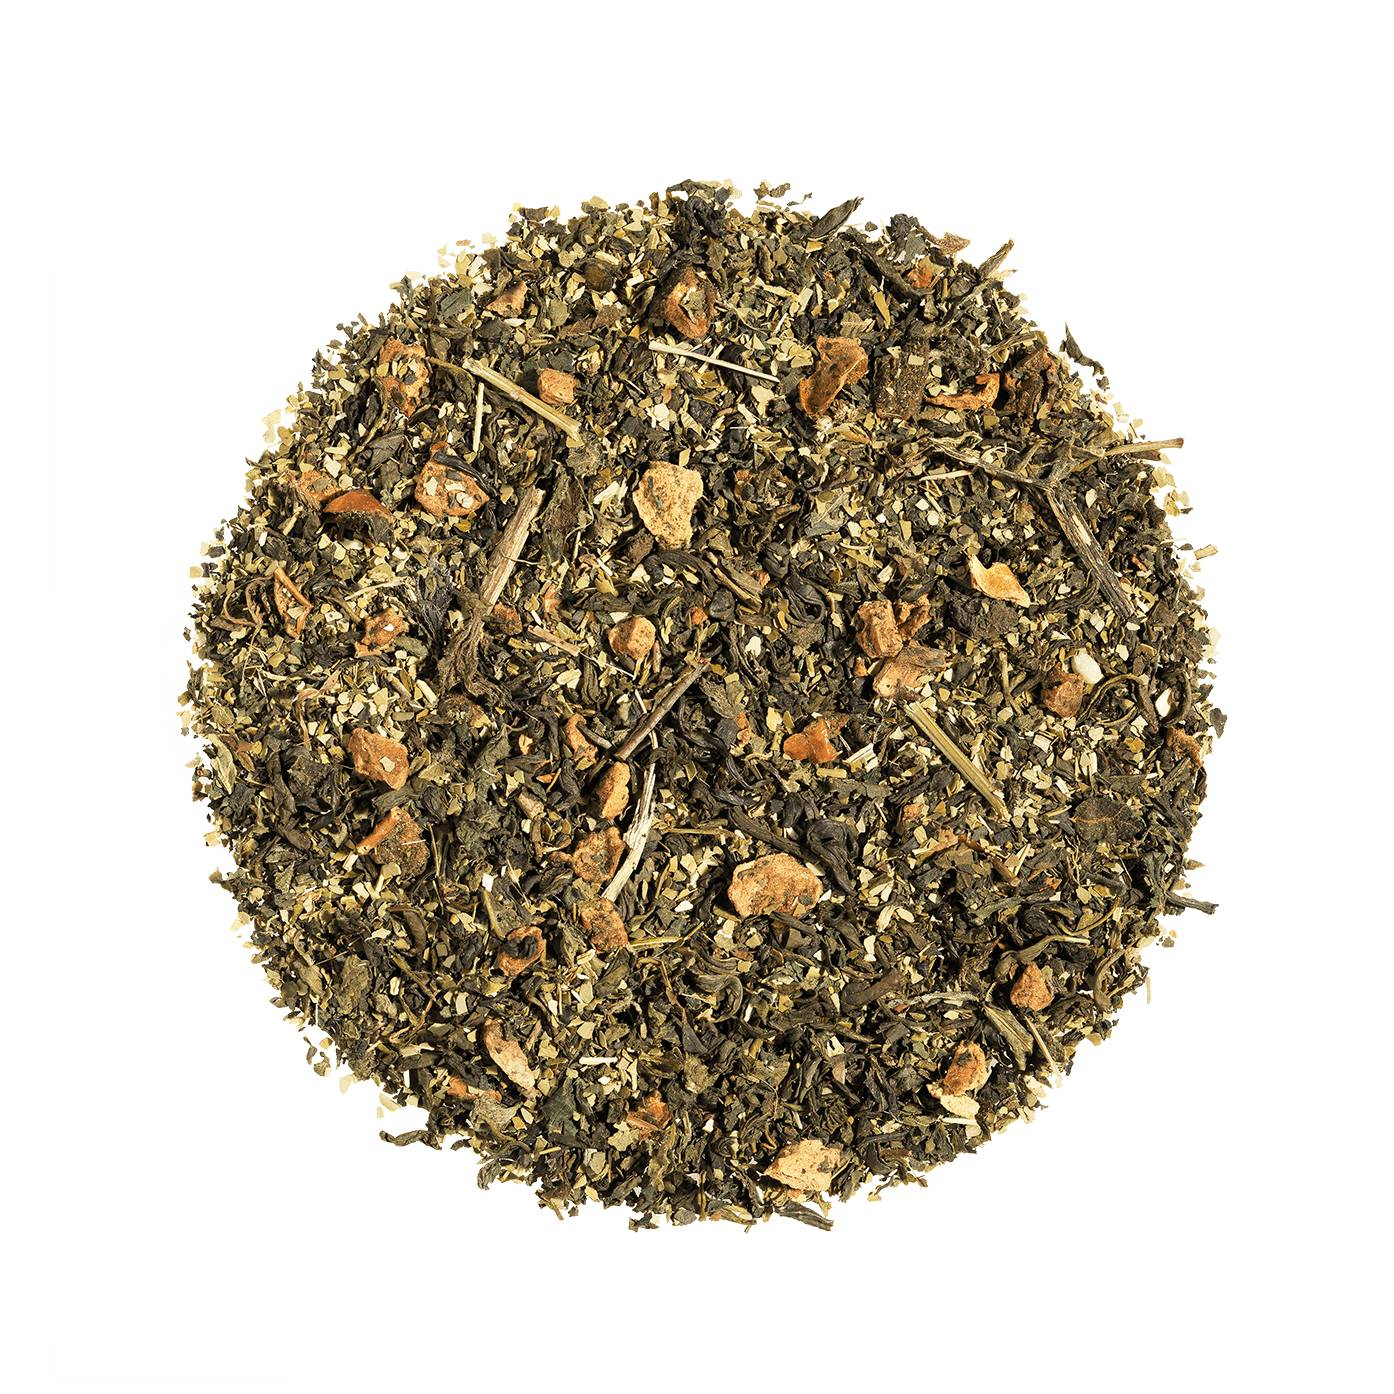 KUSMI TEA Lov is Pure bio - Thé vert, maté, ortie - Thé en vrac - Kusmi Tea